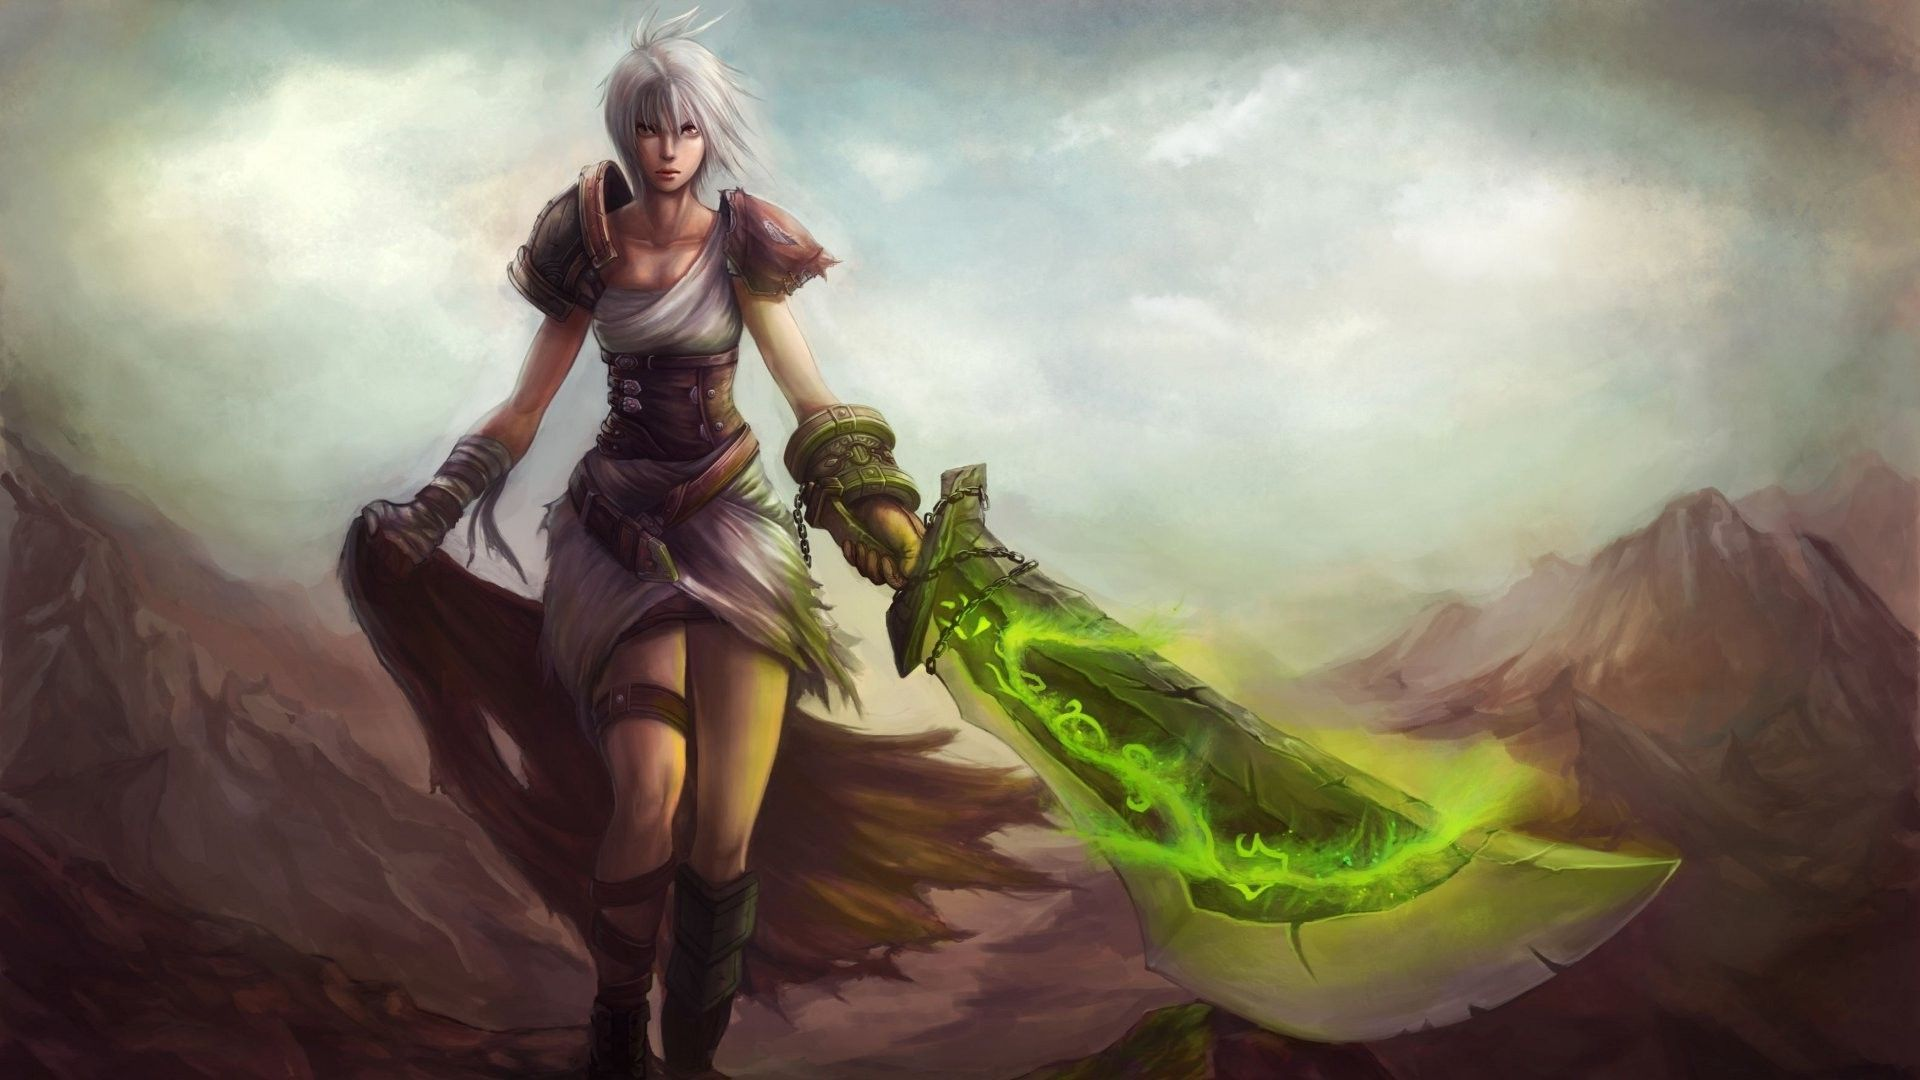 Free Download League Of Legends Wallpaper 1366x768 Riven League Of